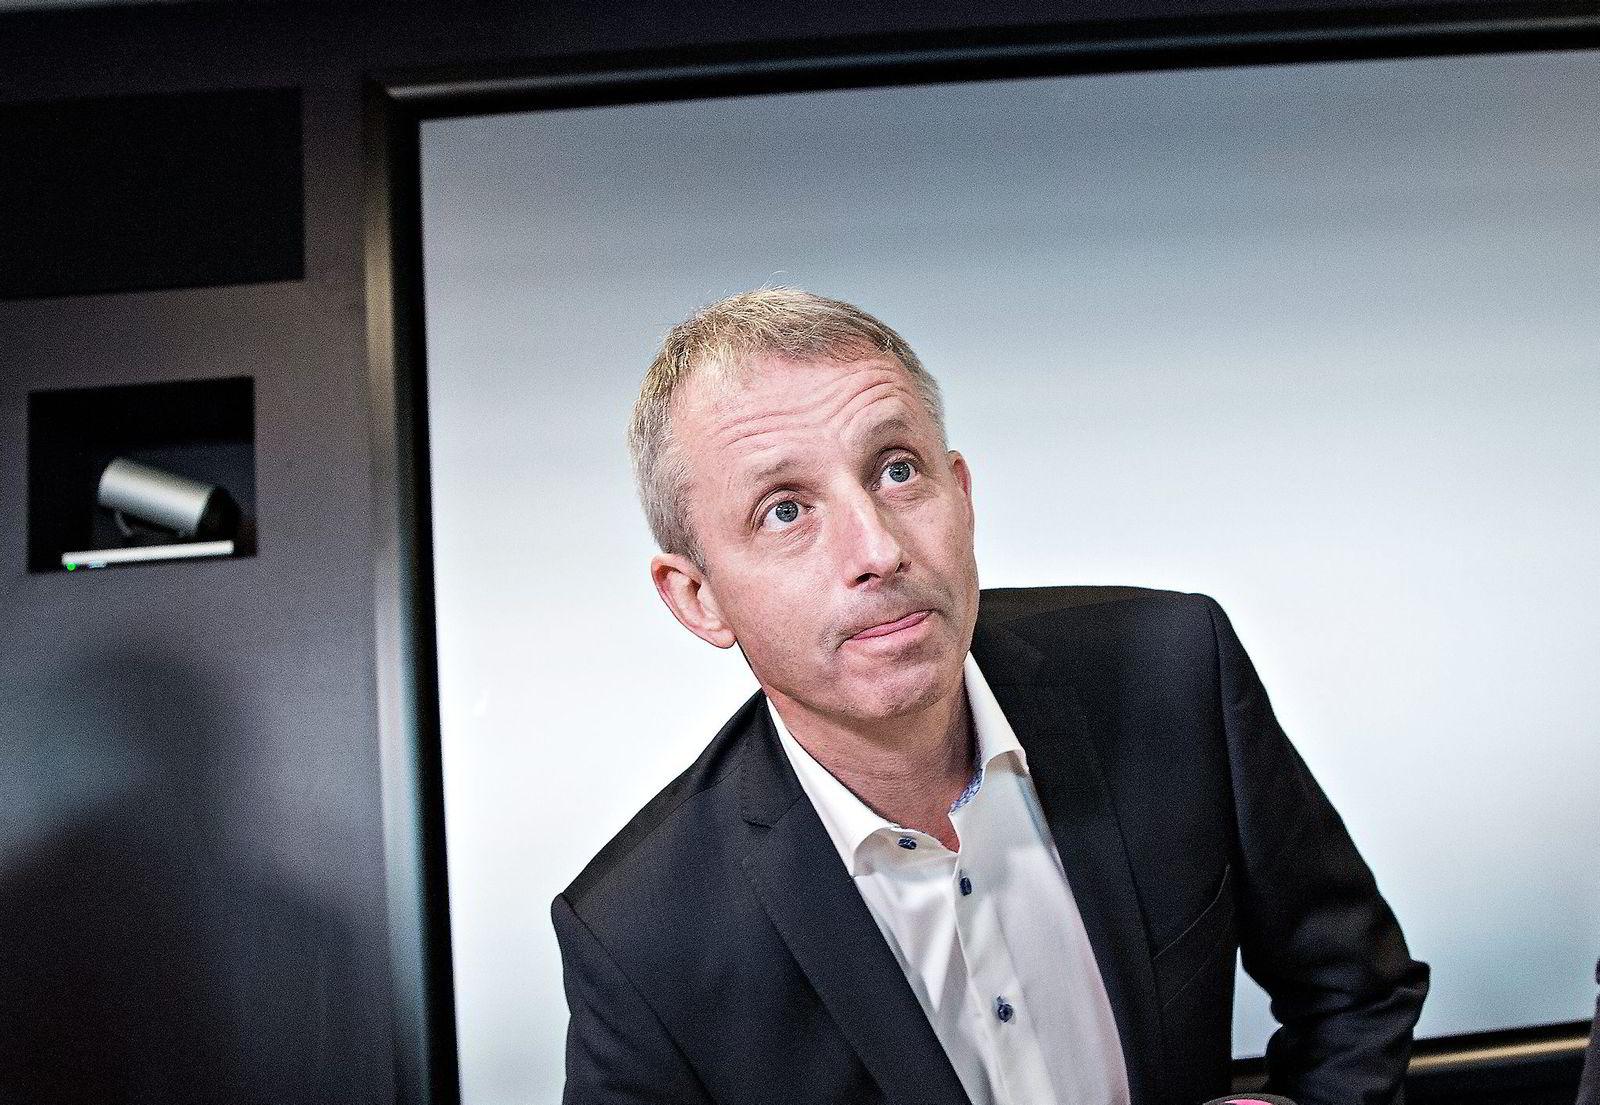 Korrupsjonssiktede Jo Lunder fikk en kort karriere i Fredriksen-systemet. Foto: Aleksander Nordahl